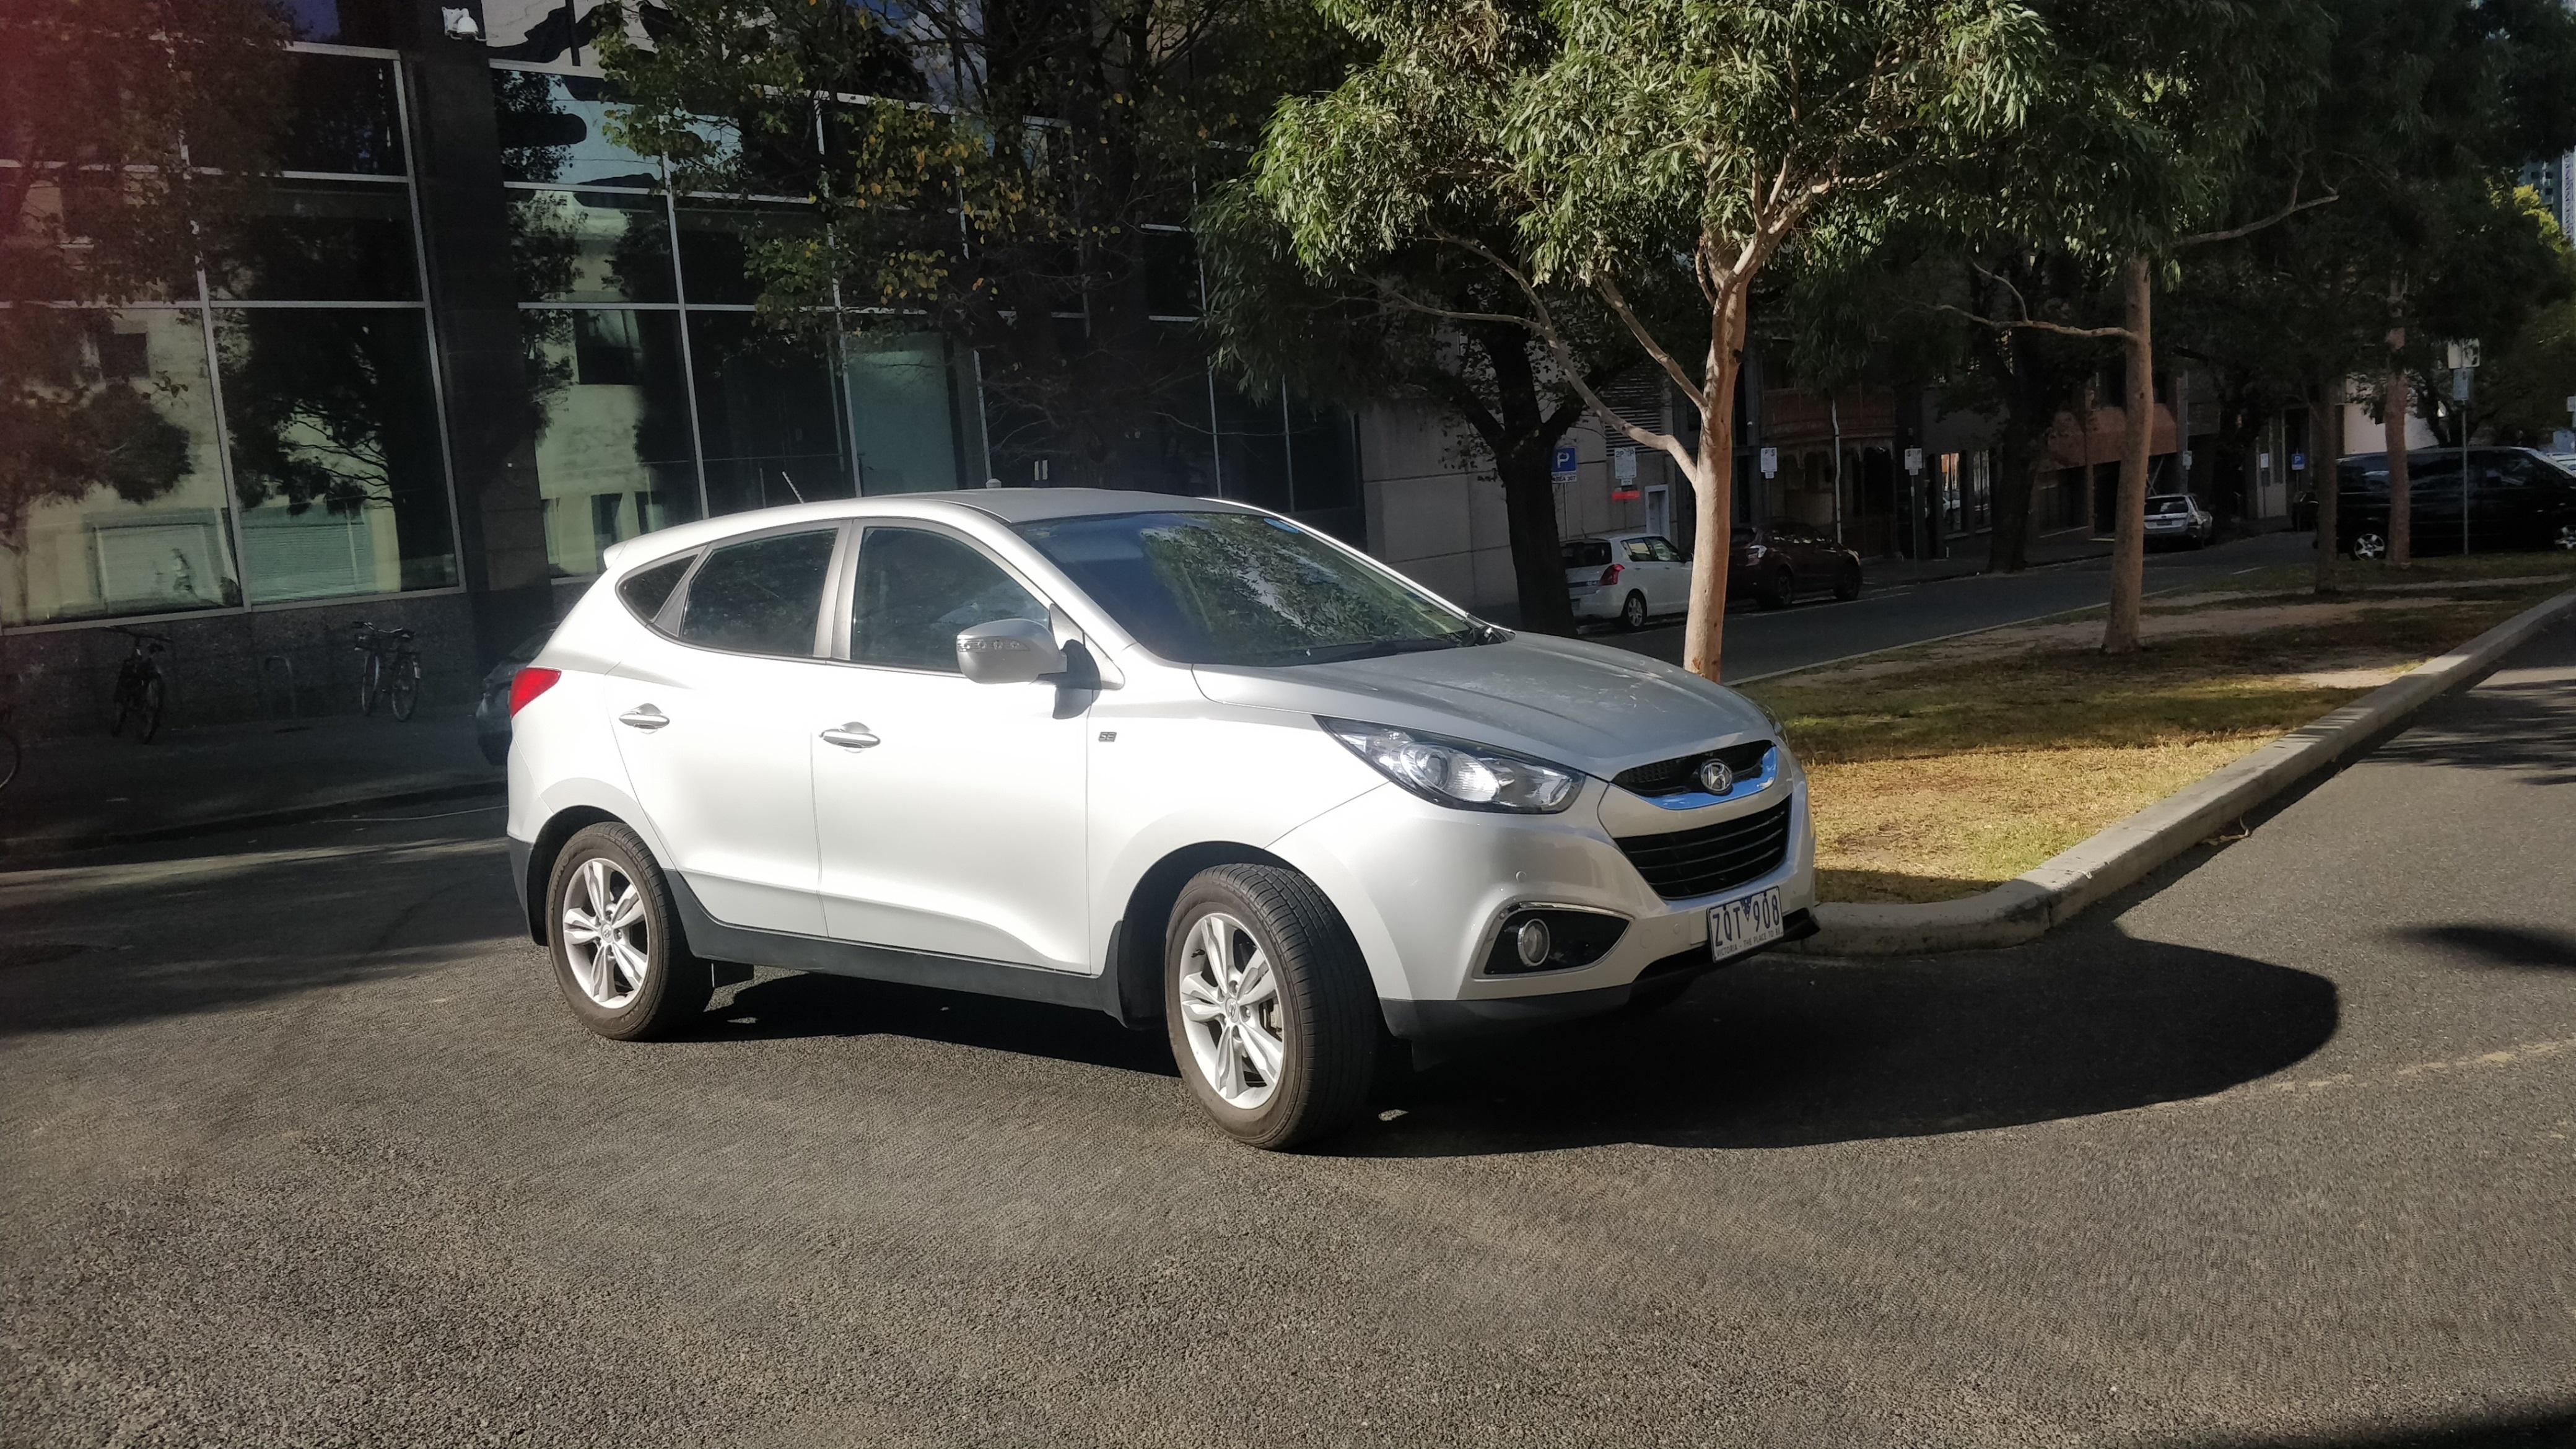 Picture of Mari Len's 2013 Hyundai IX35